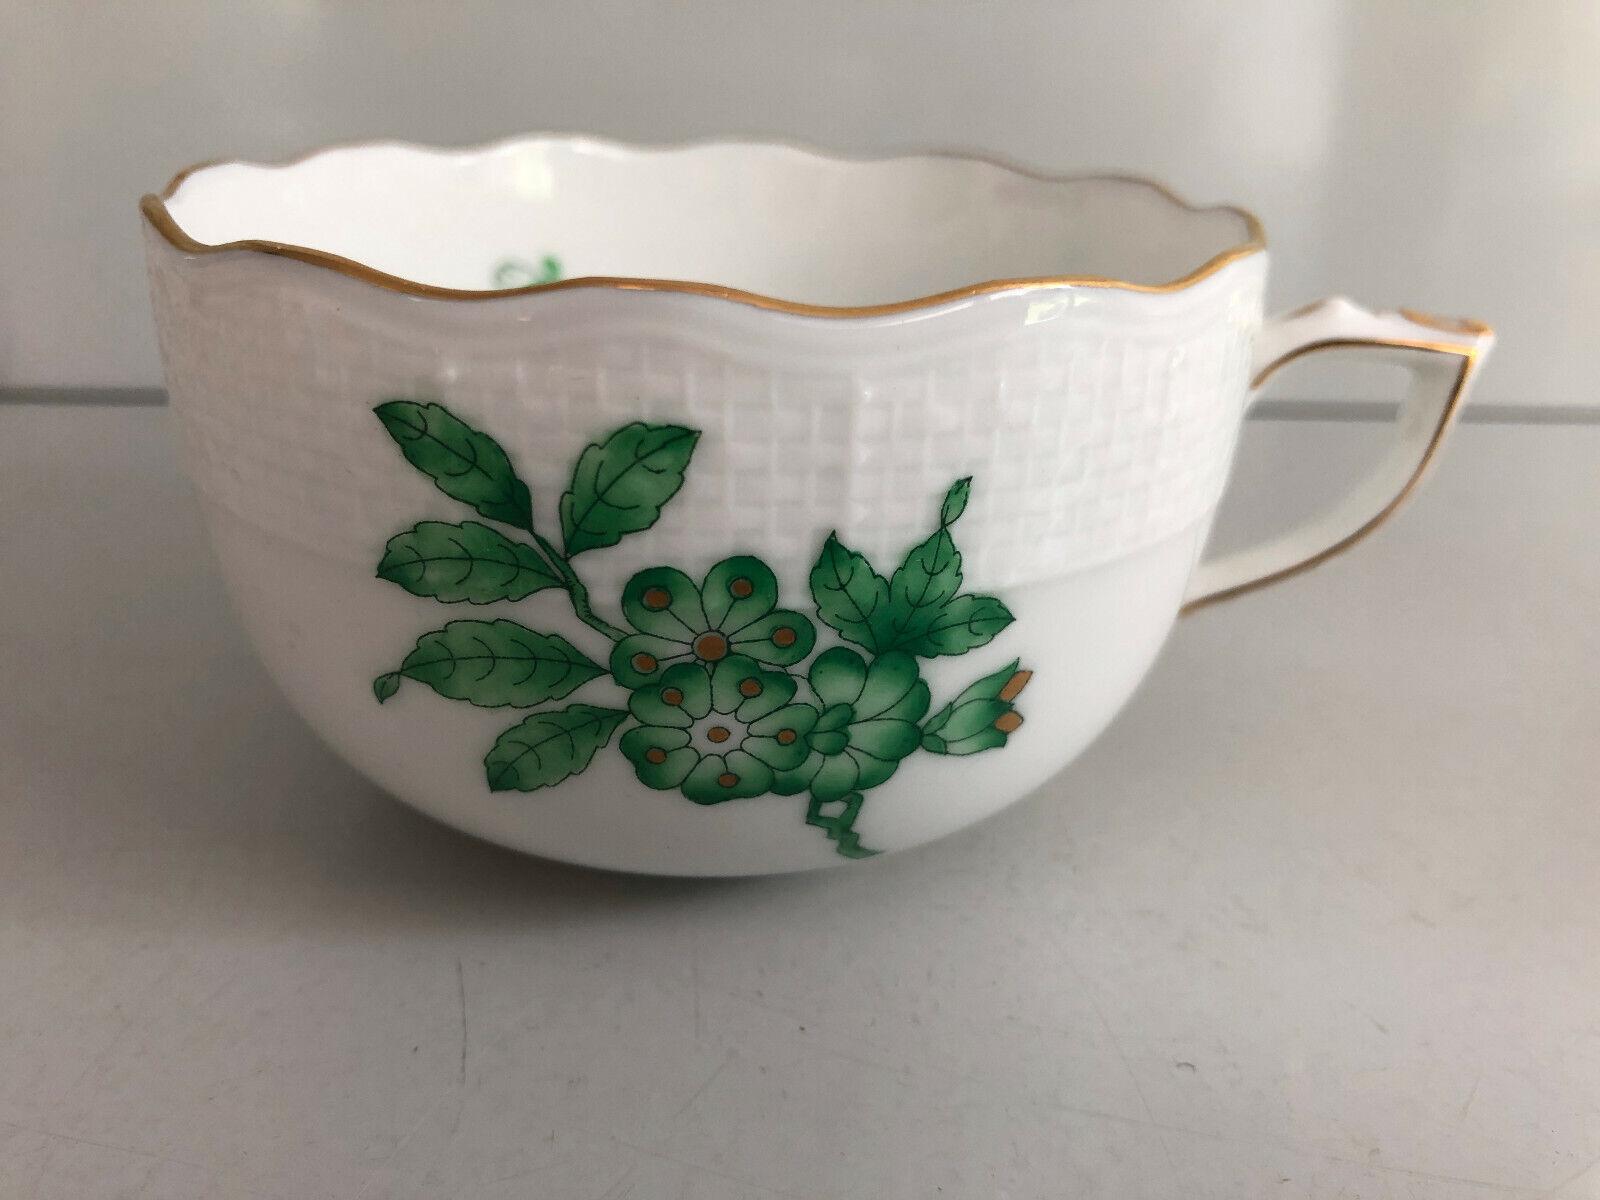 Herend 704 avarv vert Tasse à Thé inexploitées tea cup